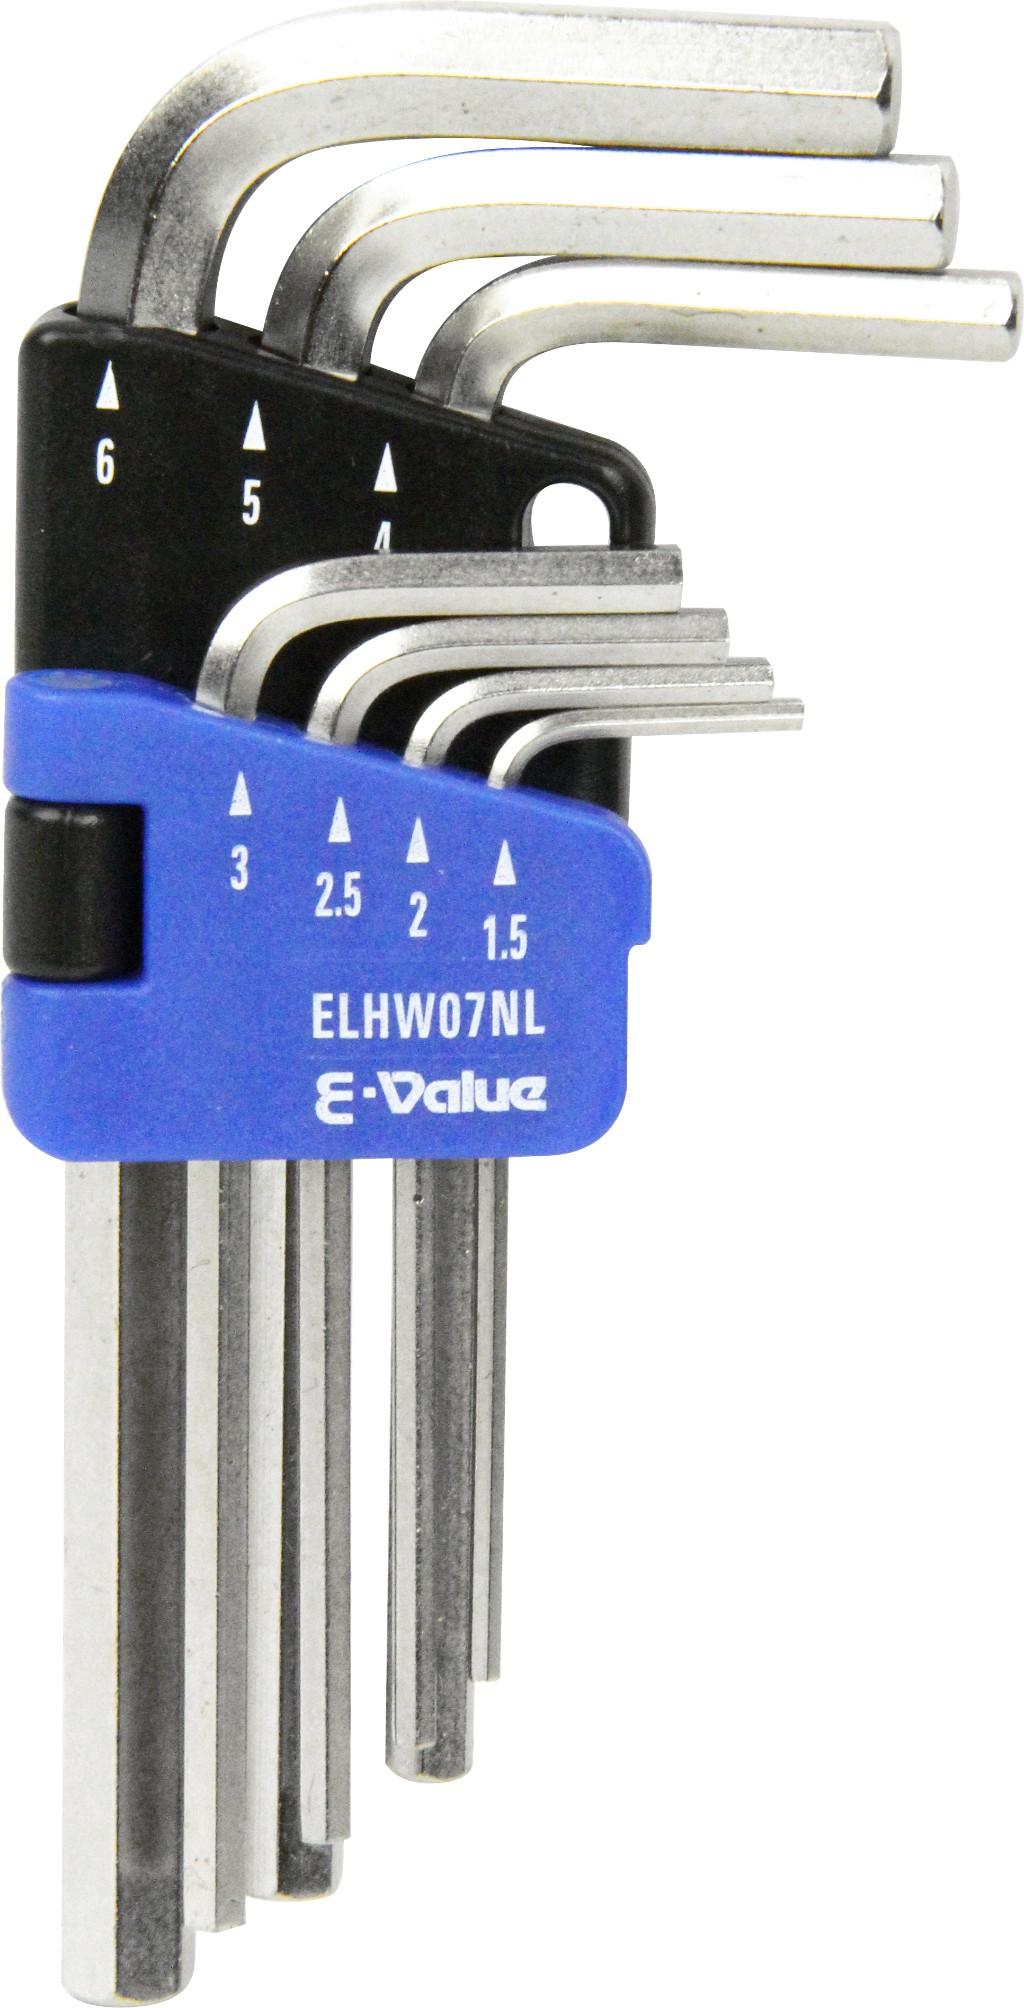 E-Value イーバリュー六角棒レンチセット ミリ ELHW07NL